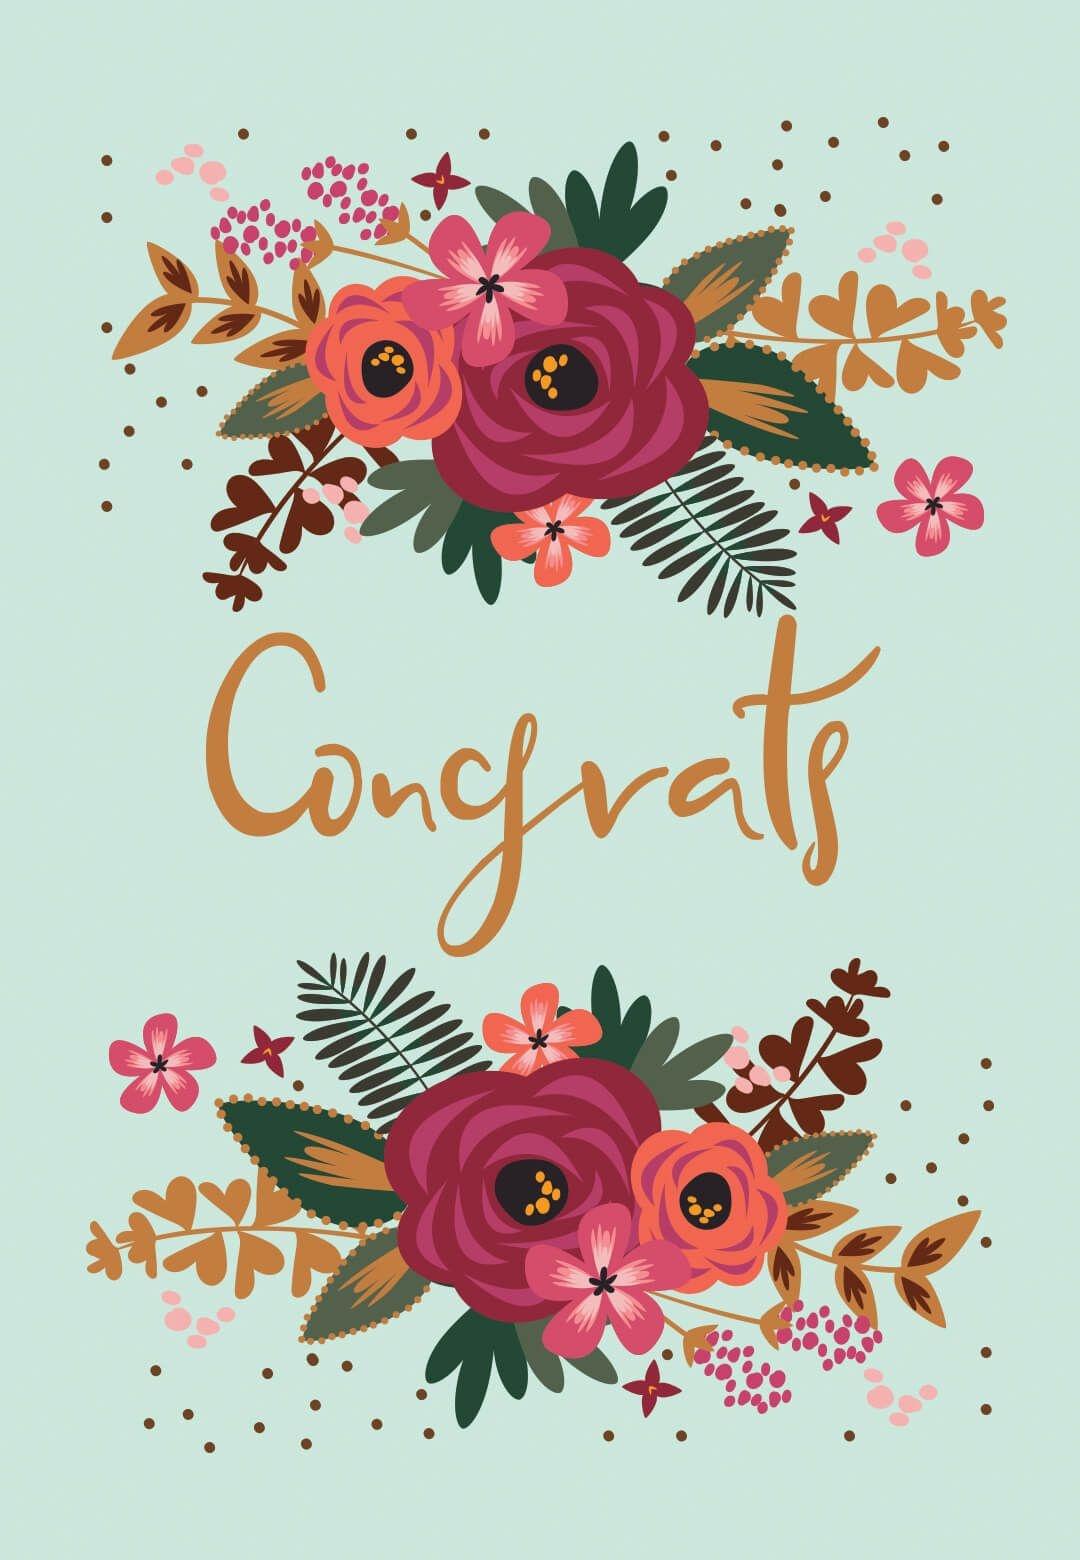 Floral Congrats - Free Printable Wedding Congratulations Card - Free Printable Wedding Shower Greeting Cards